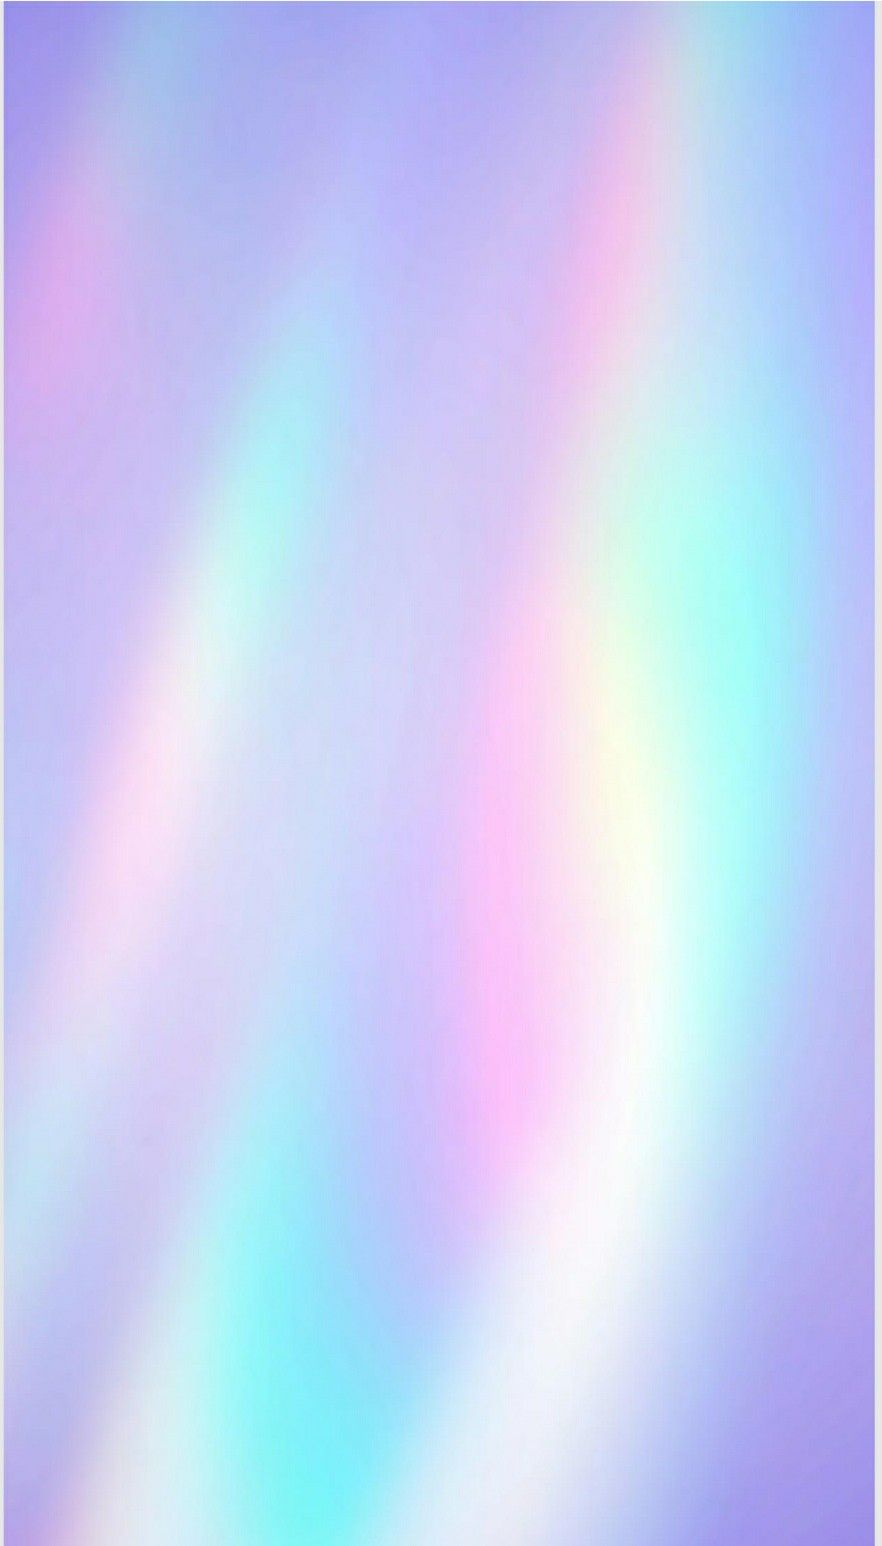 Update Holographic Wallpapers Rainbow Wallpaper Aesthetic Iphone Wallpaper